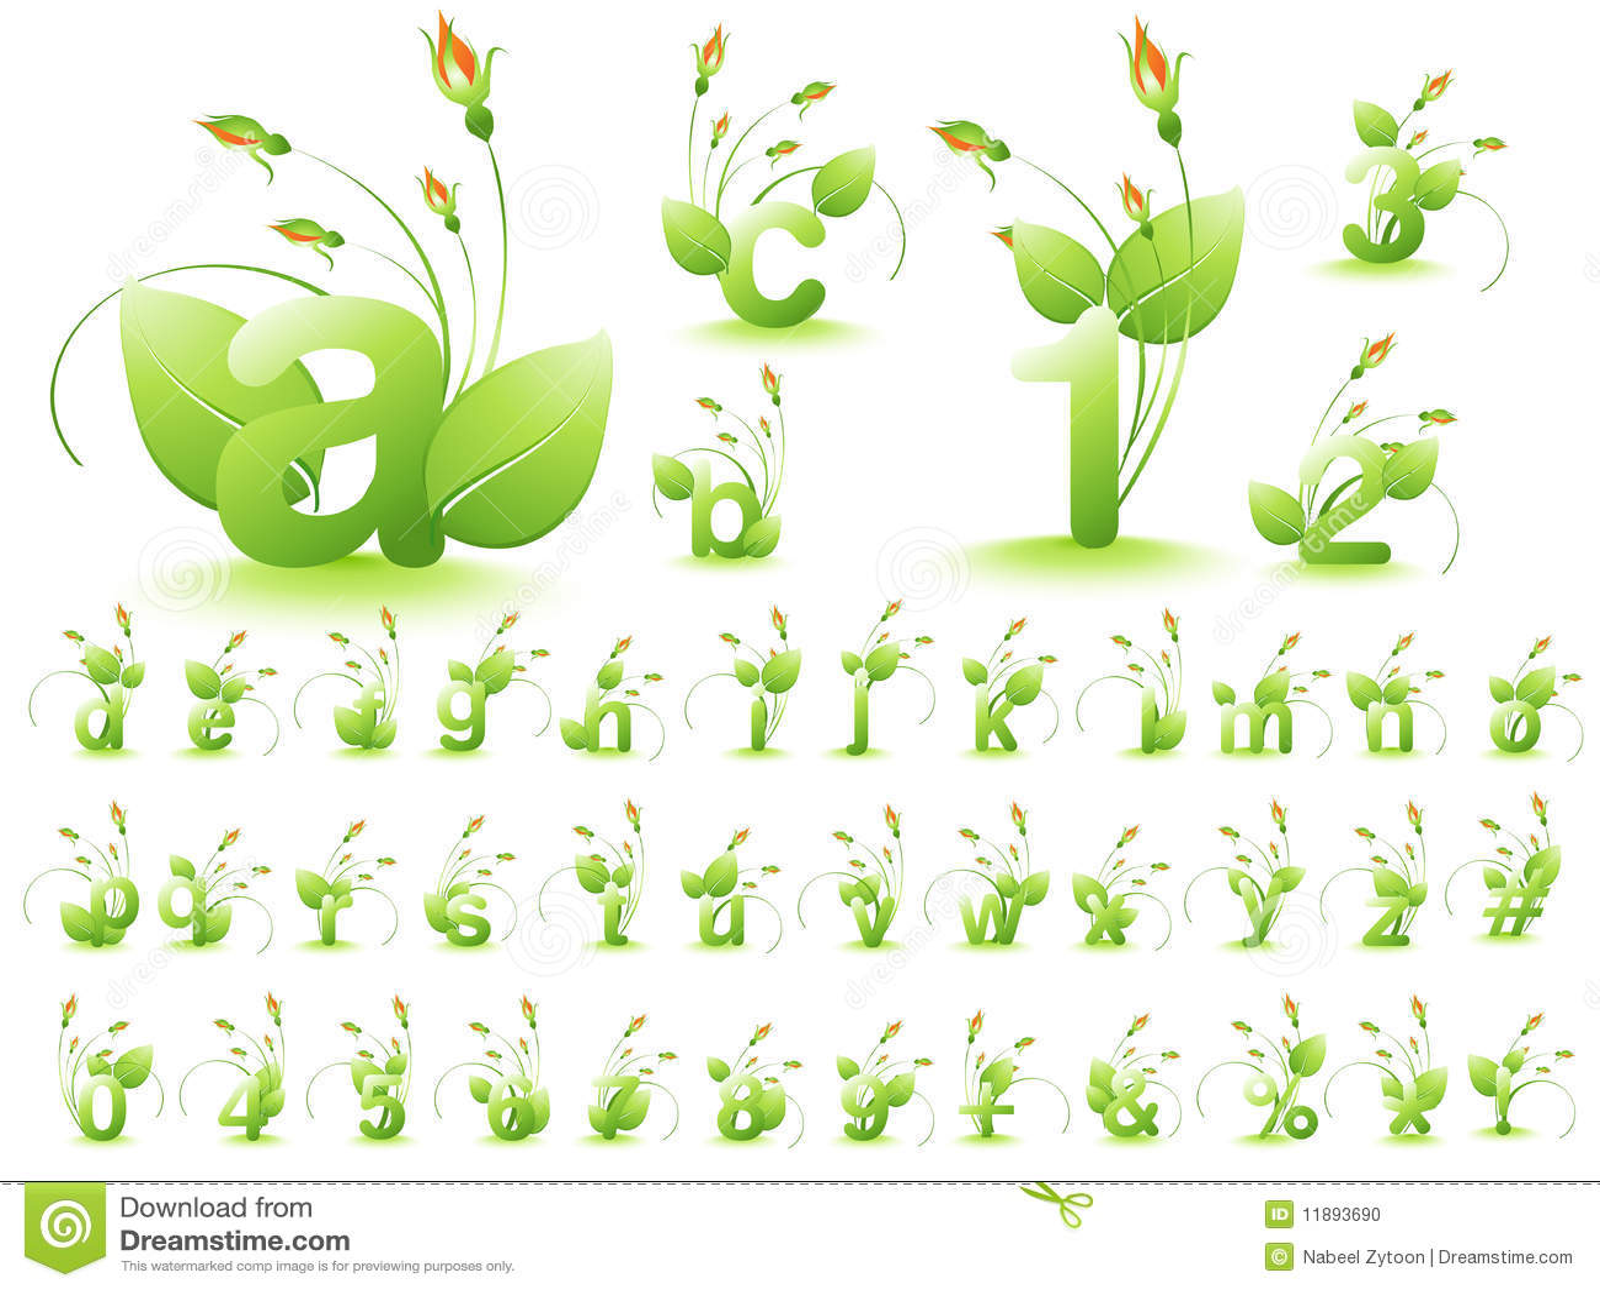 Free Fonts Nature Fonts Find Font Samples Free